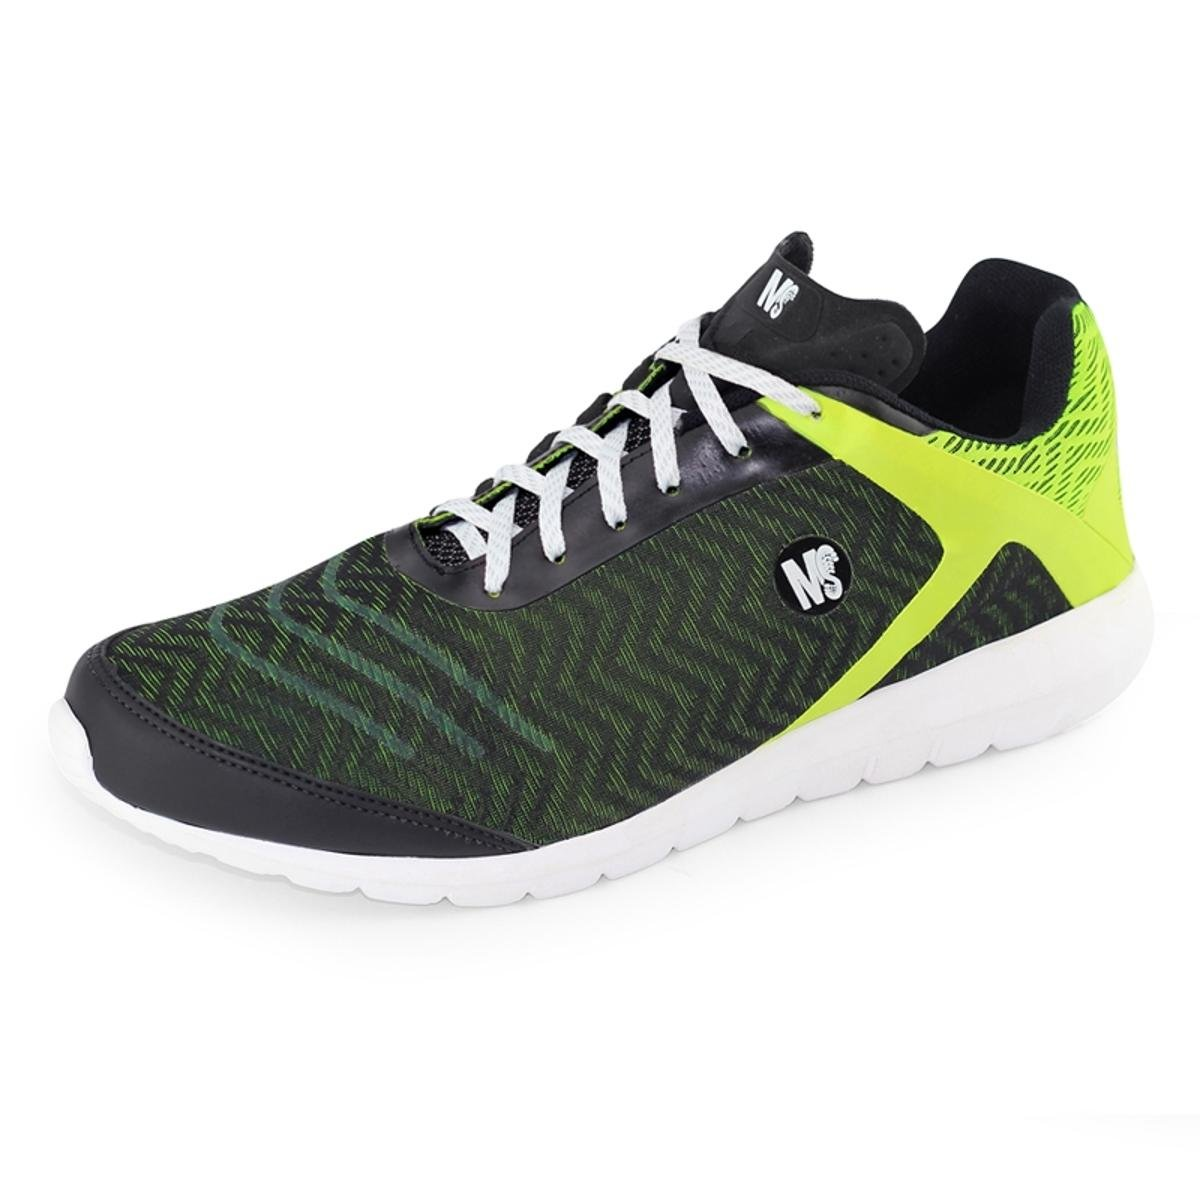 Branco 0722 Meu e 0722 Verde Tênis Sapato Tênis FIT Meu Verde Sapato FIT qzApw7Z